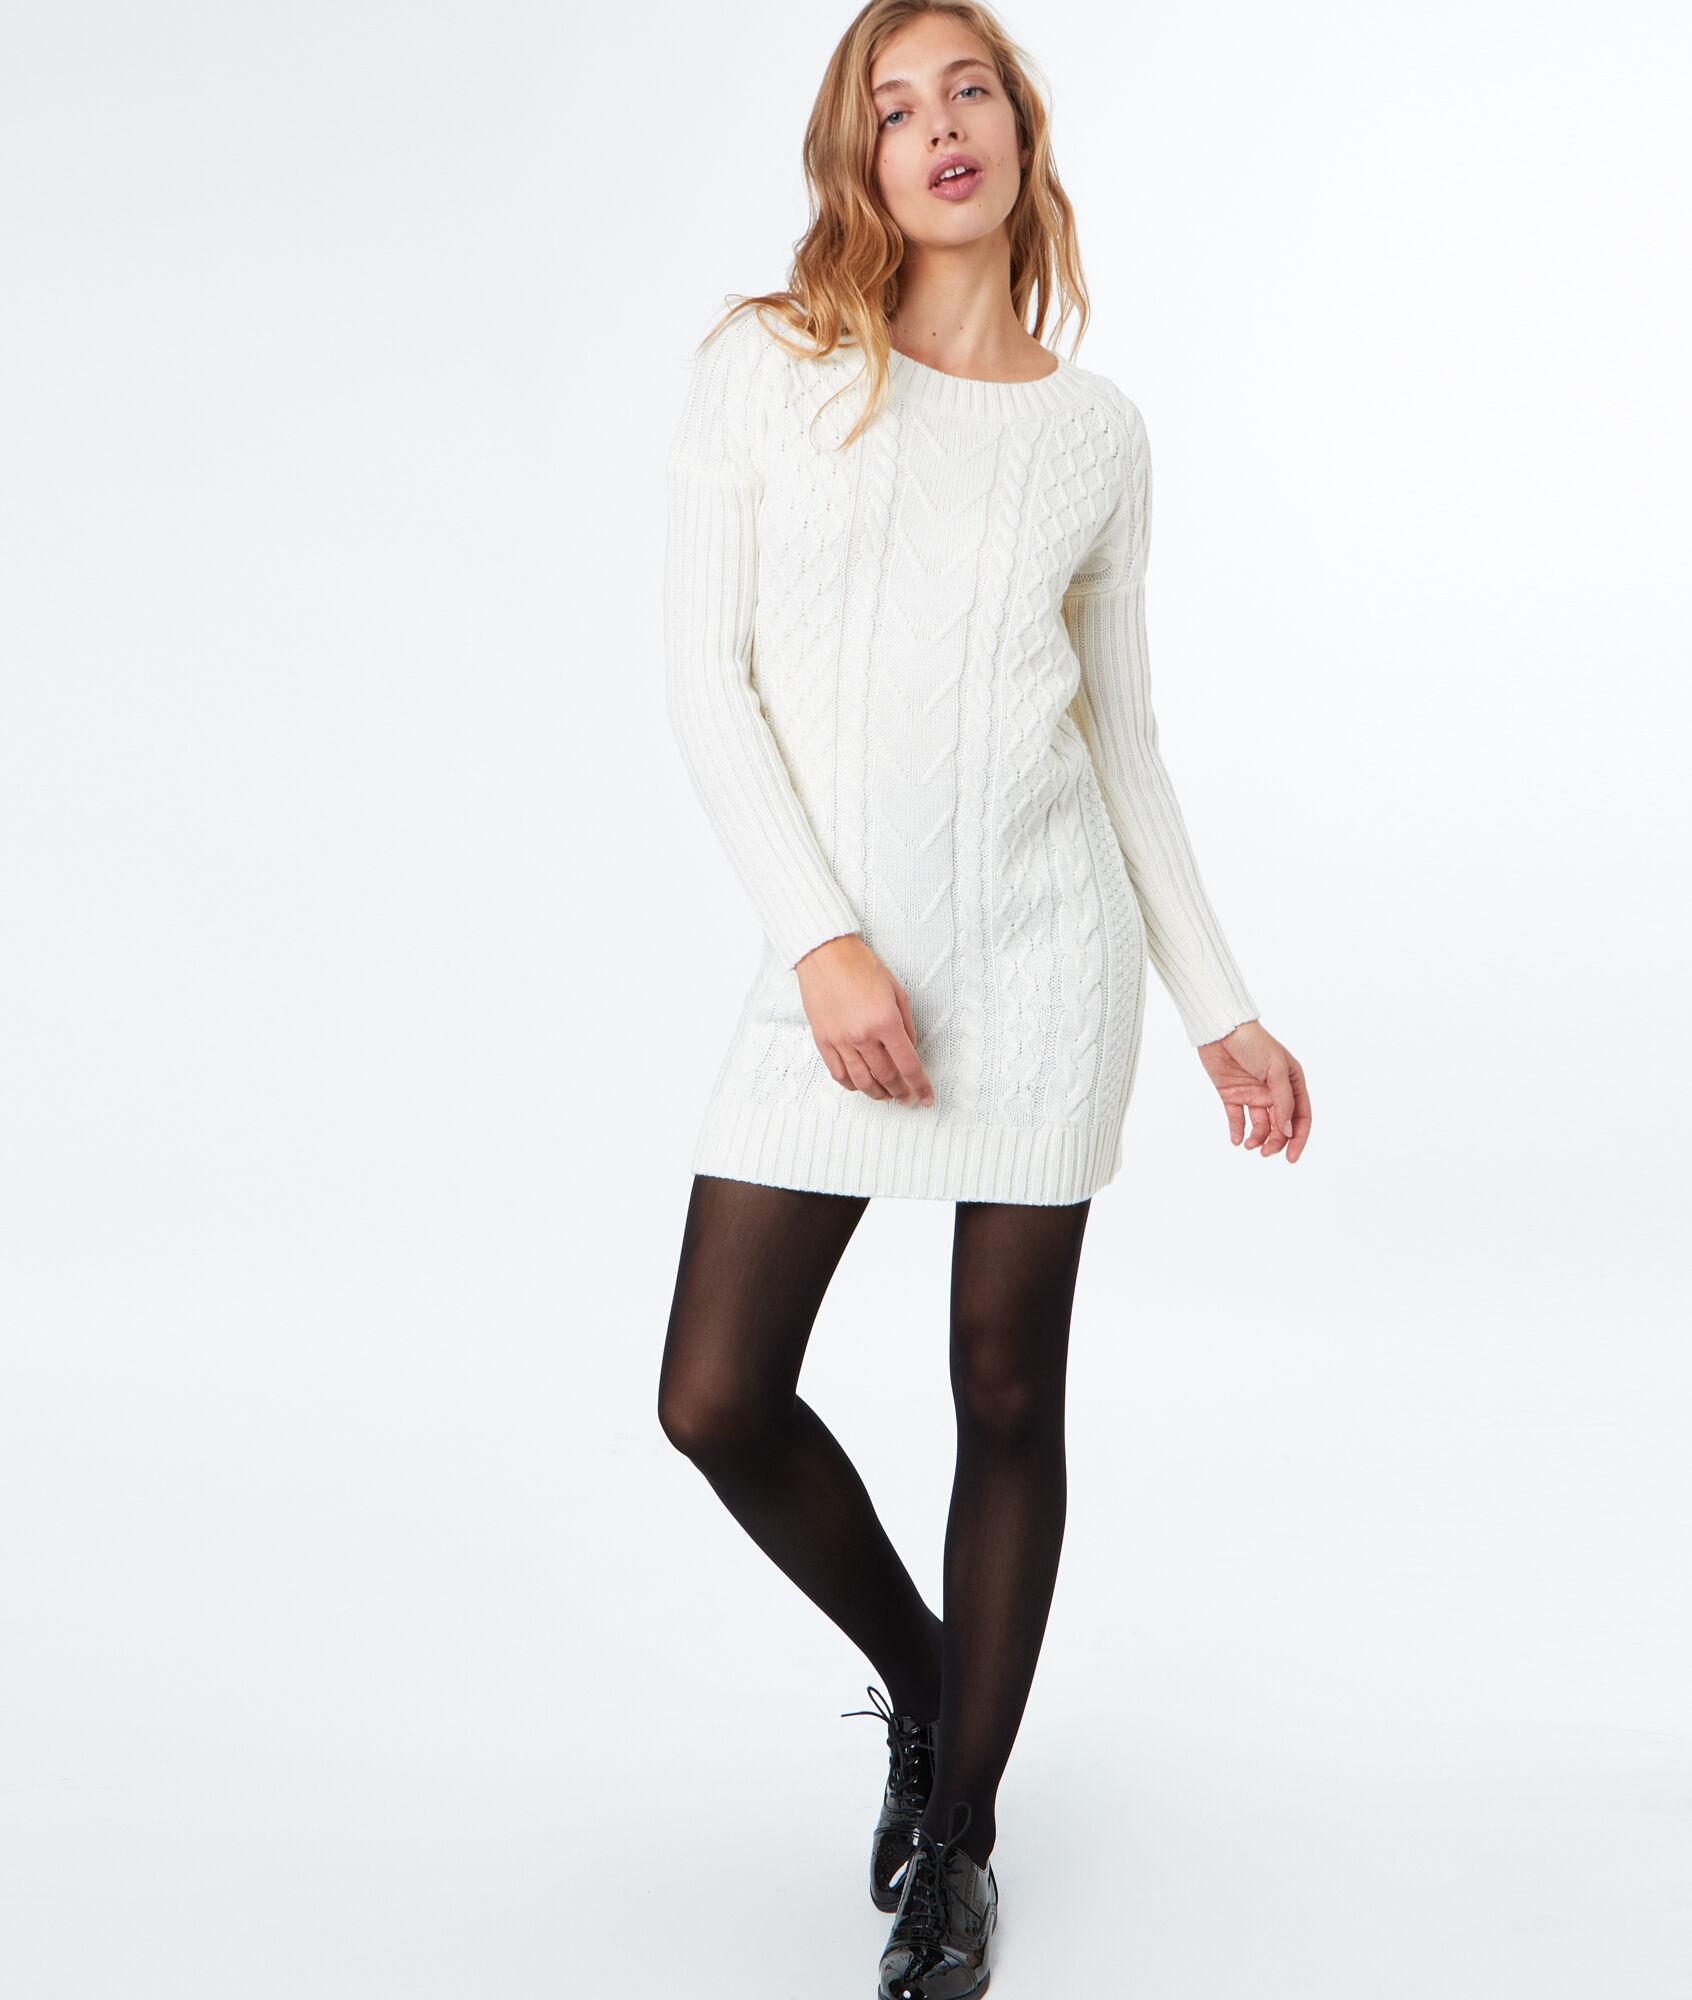 Robe laine blanc casse